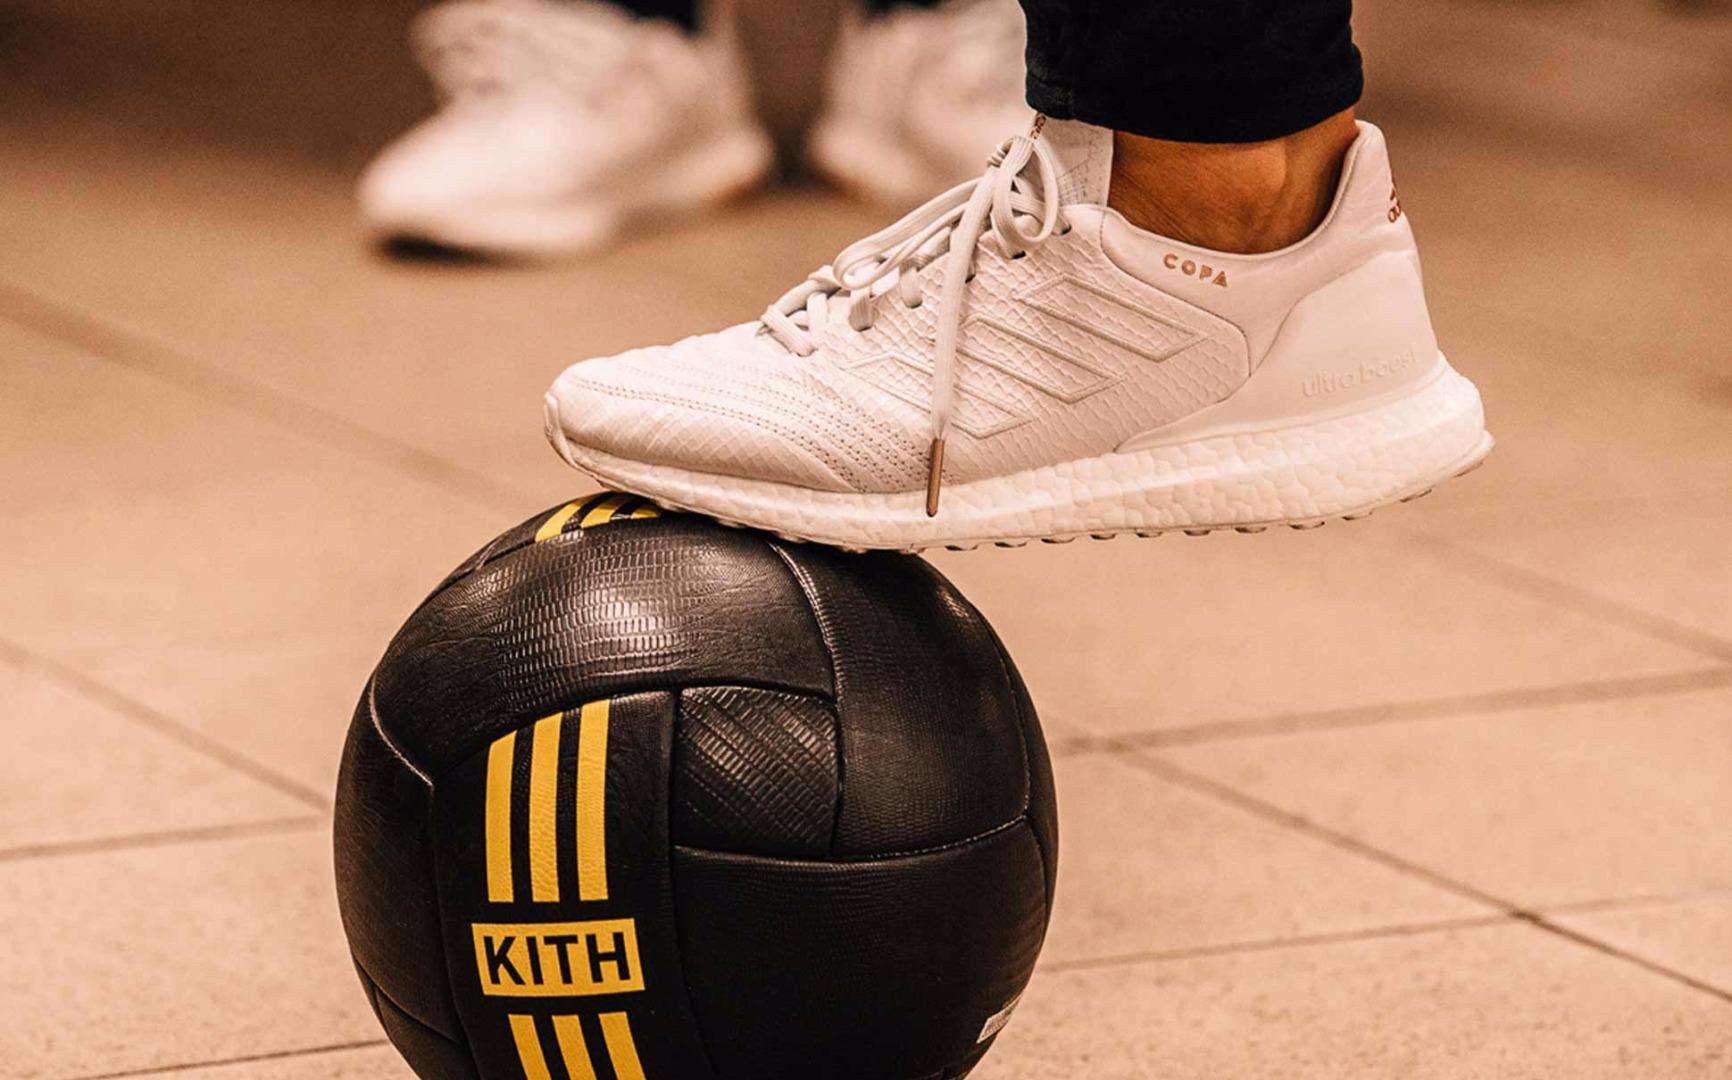 e0b541c1ed3 KITH Cobras x adidas Football Lookbook - SoccerBible